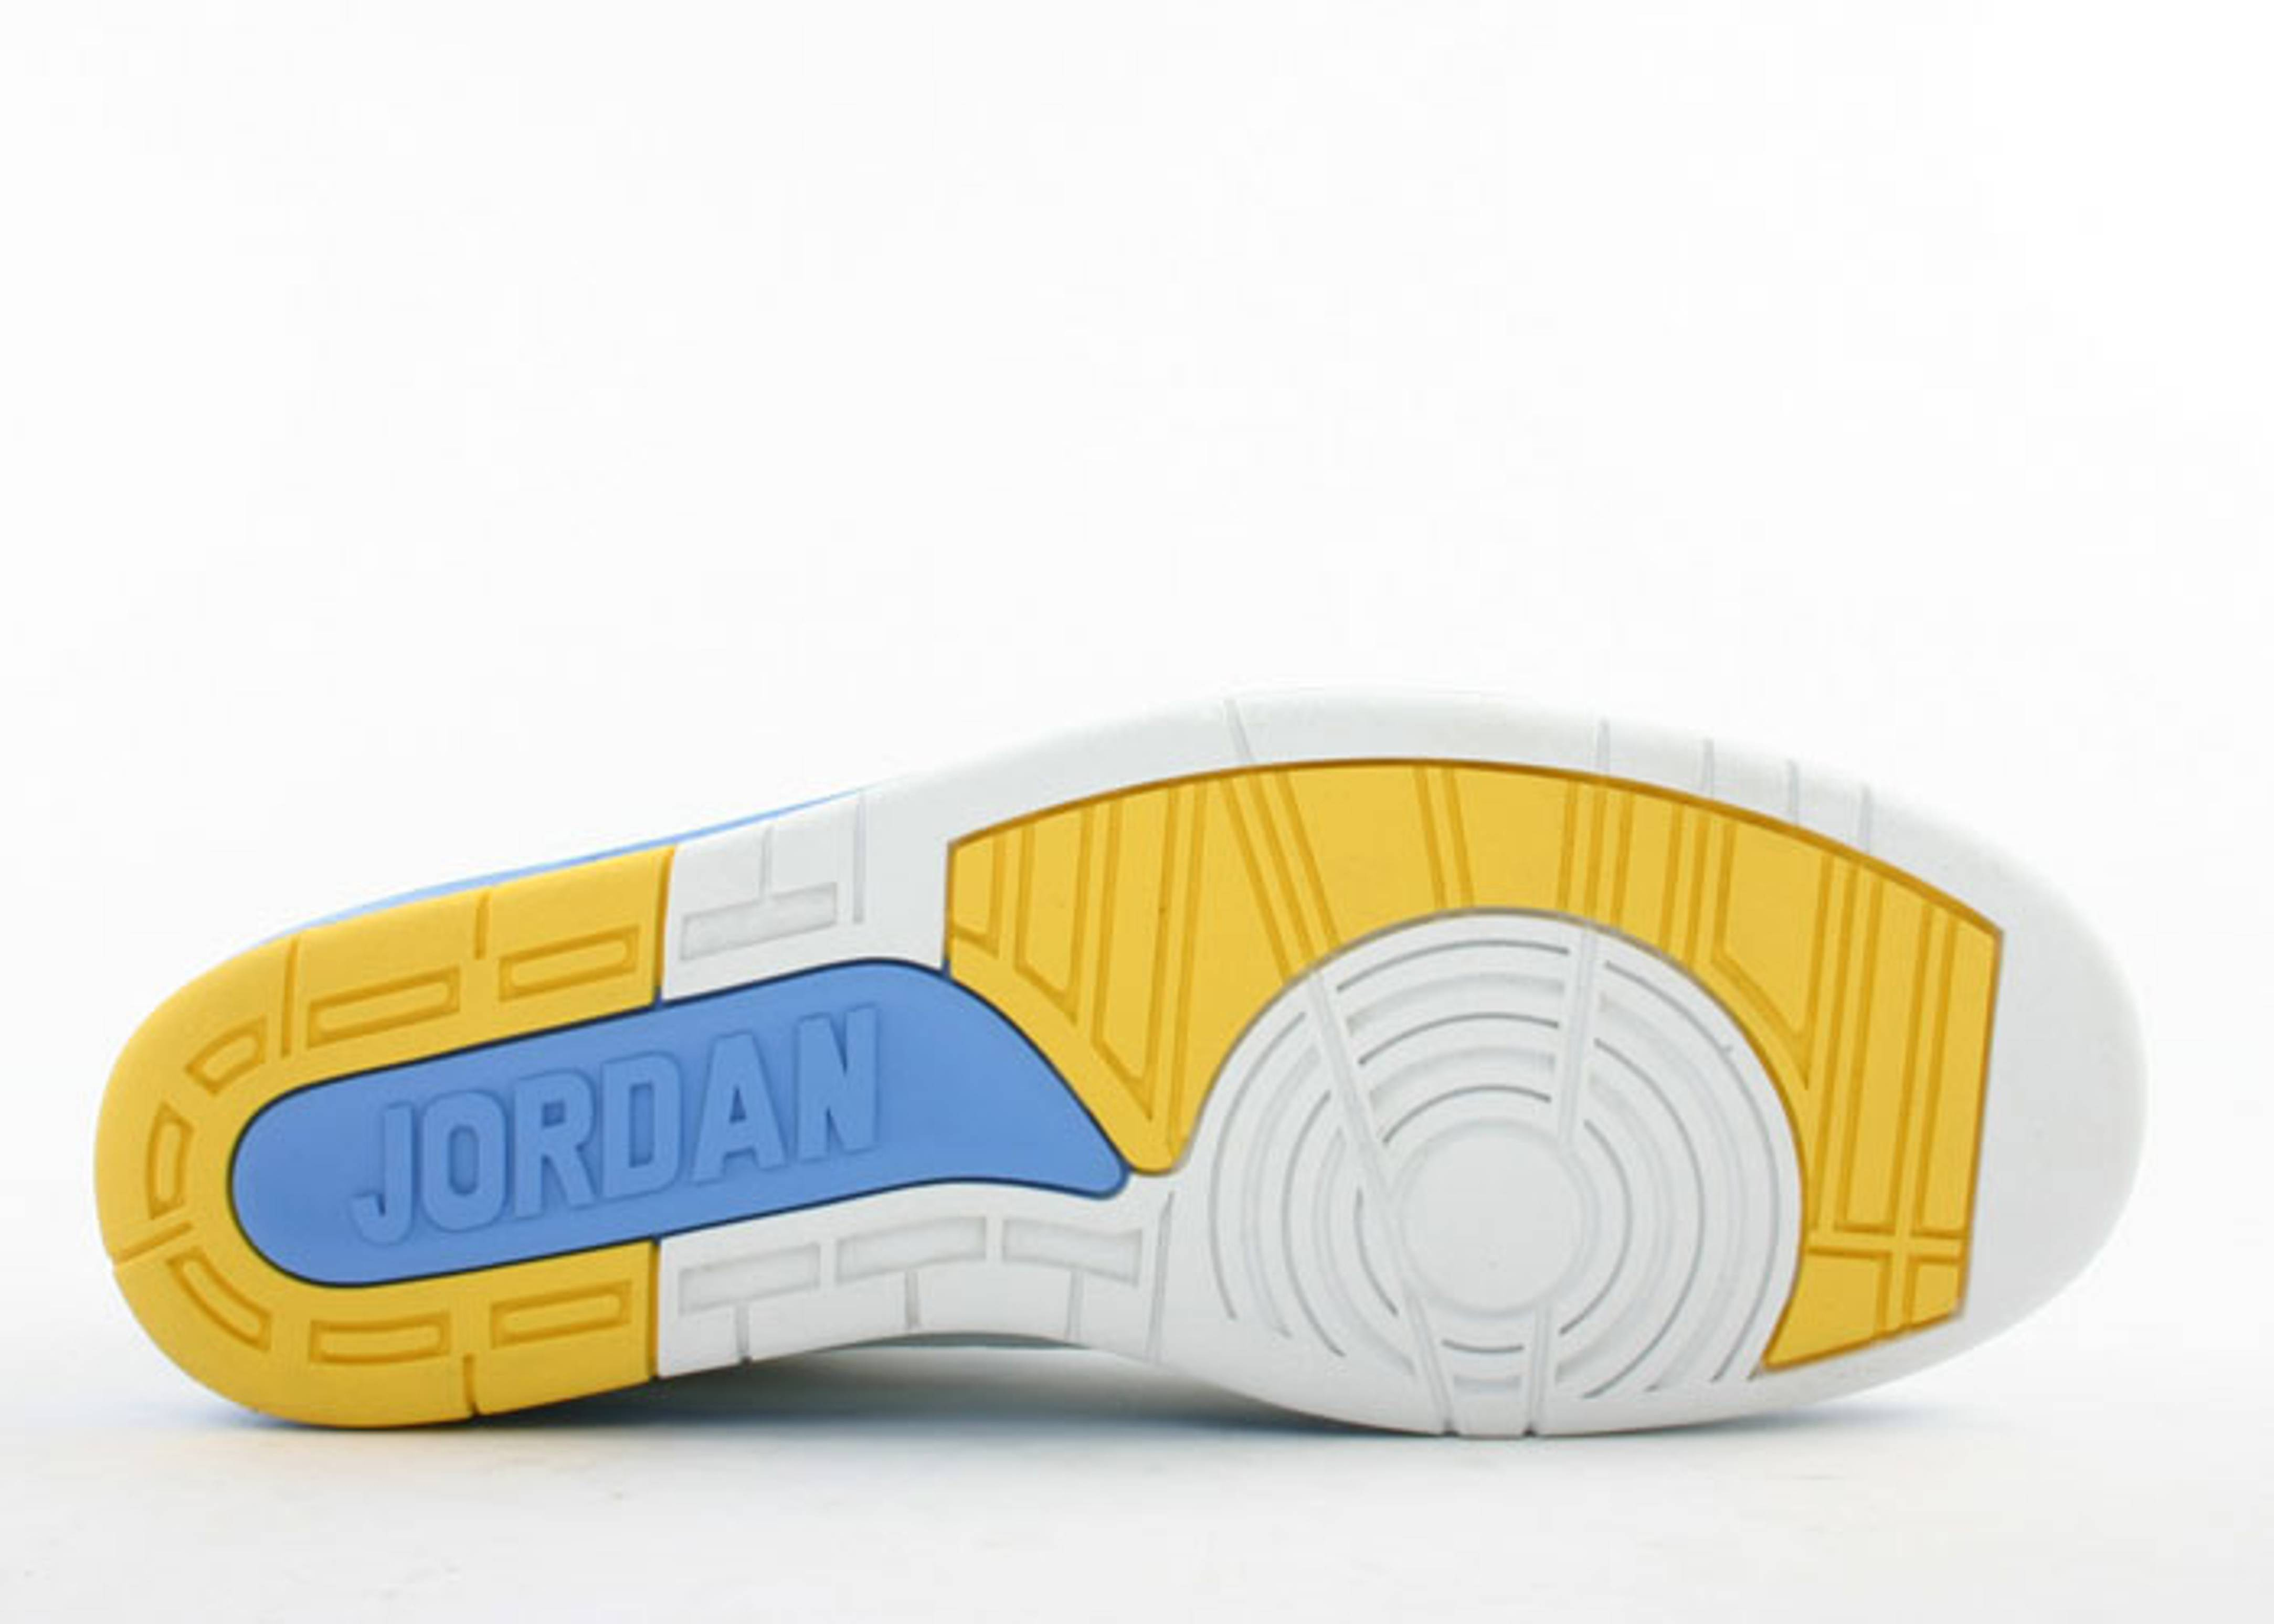 6a99bc3cf0a8 Air Jordan 2 Retro